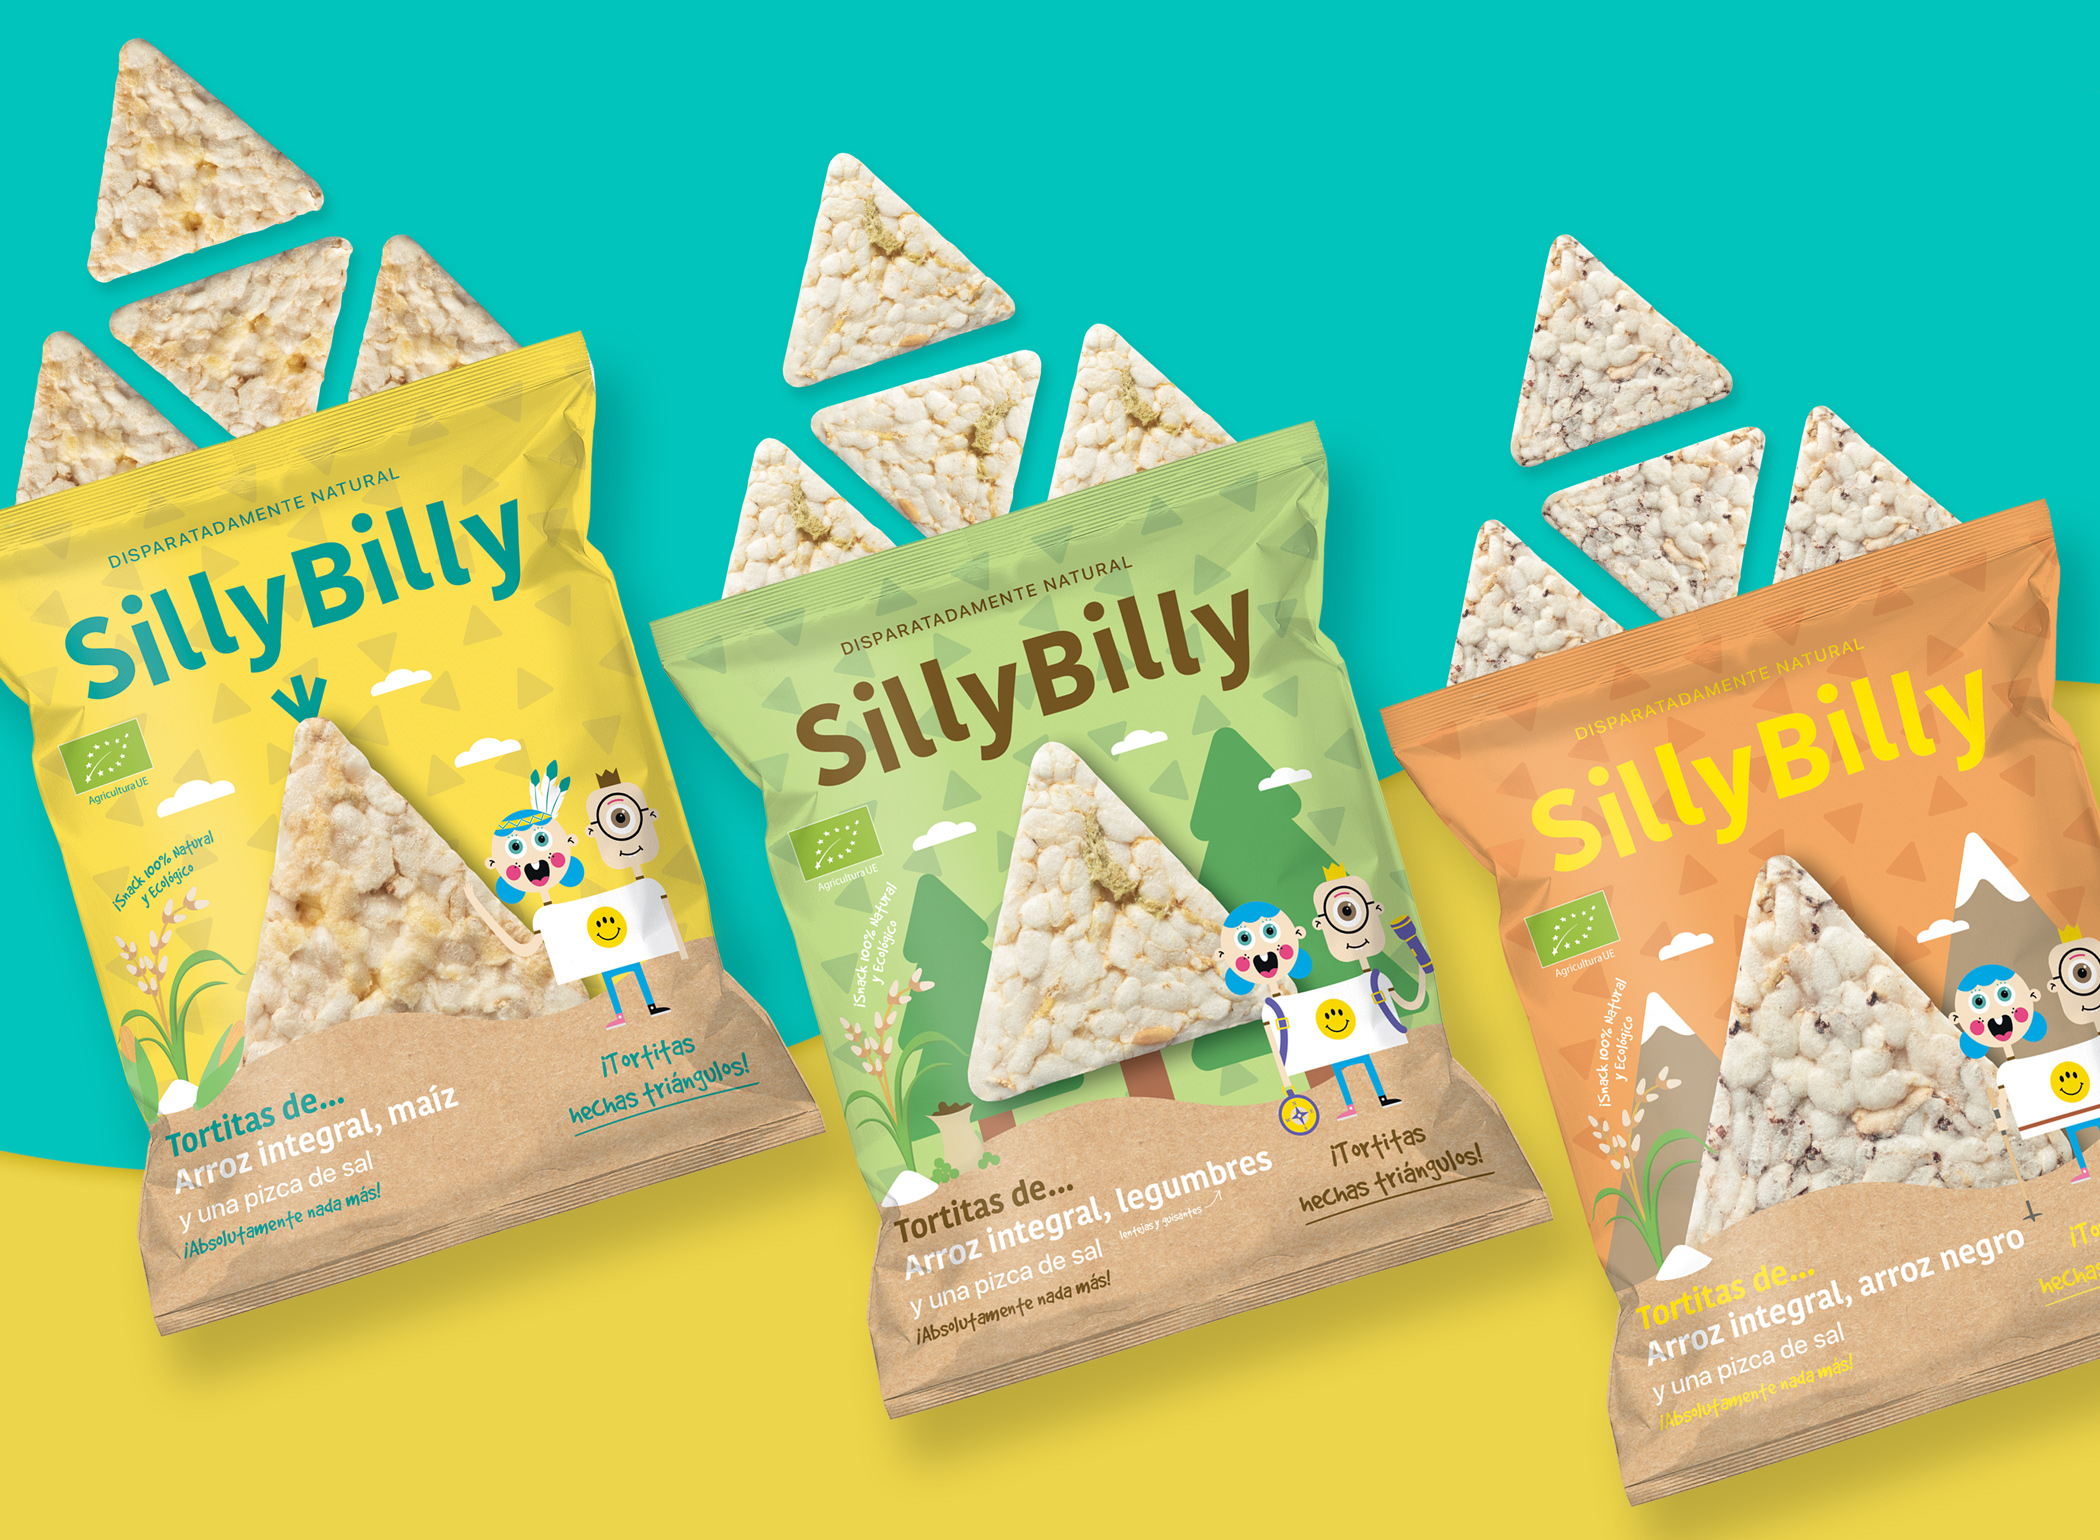 Mara Design Creates New Packaging for SillyBilly Rice Snacks